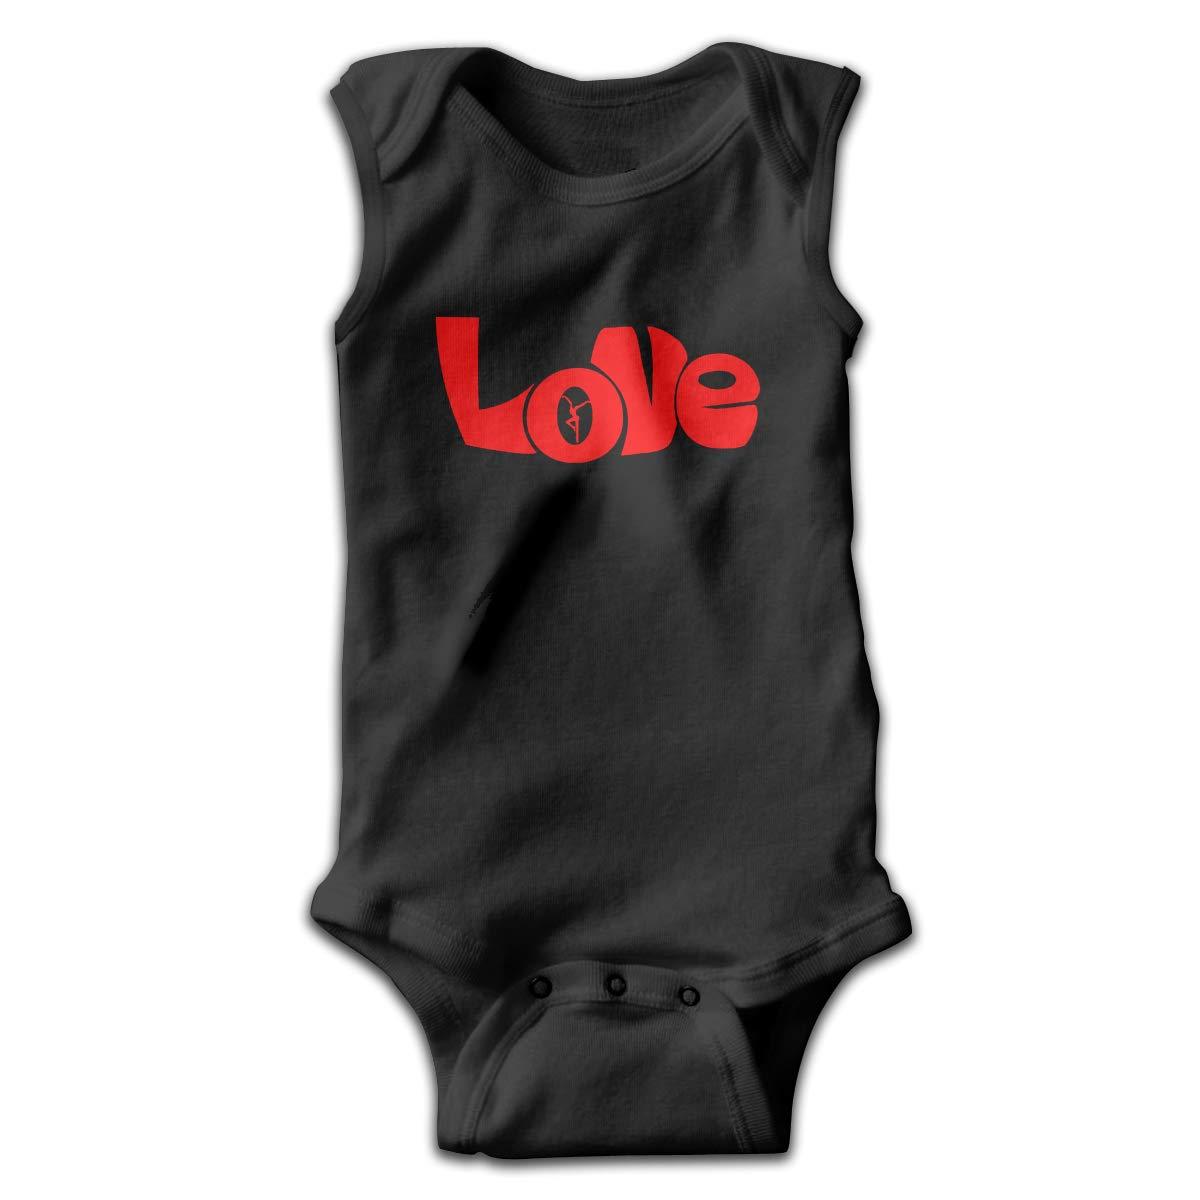 Love Dave Matthews Band Sleeveless Trottie Jumpsuit Cute Newborn Outfits Summer Bodysuits